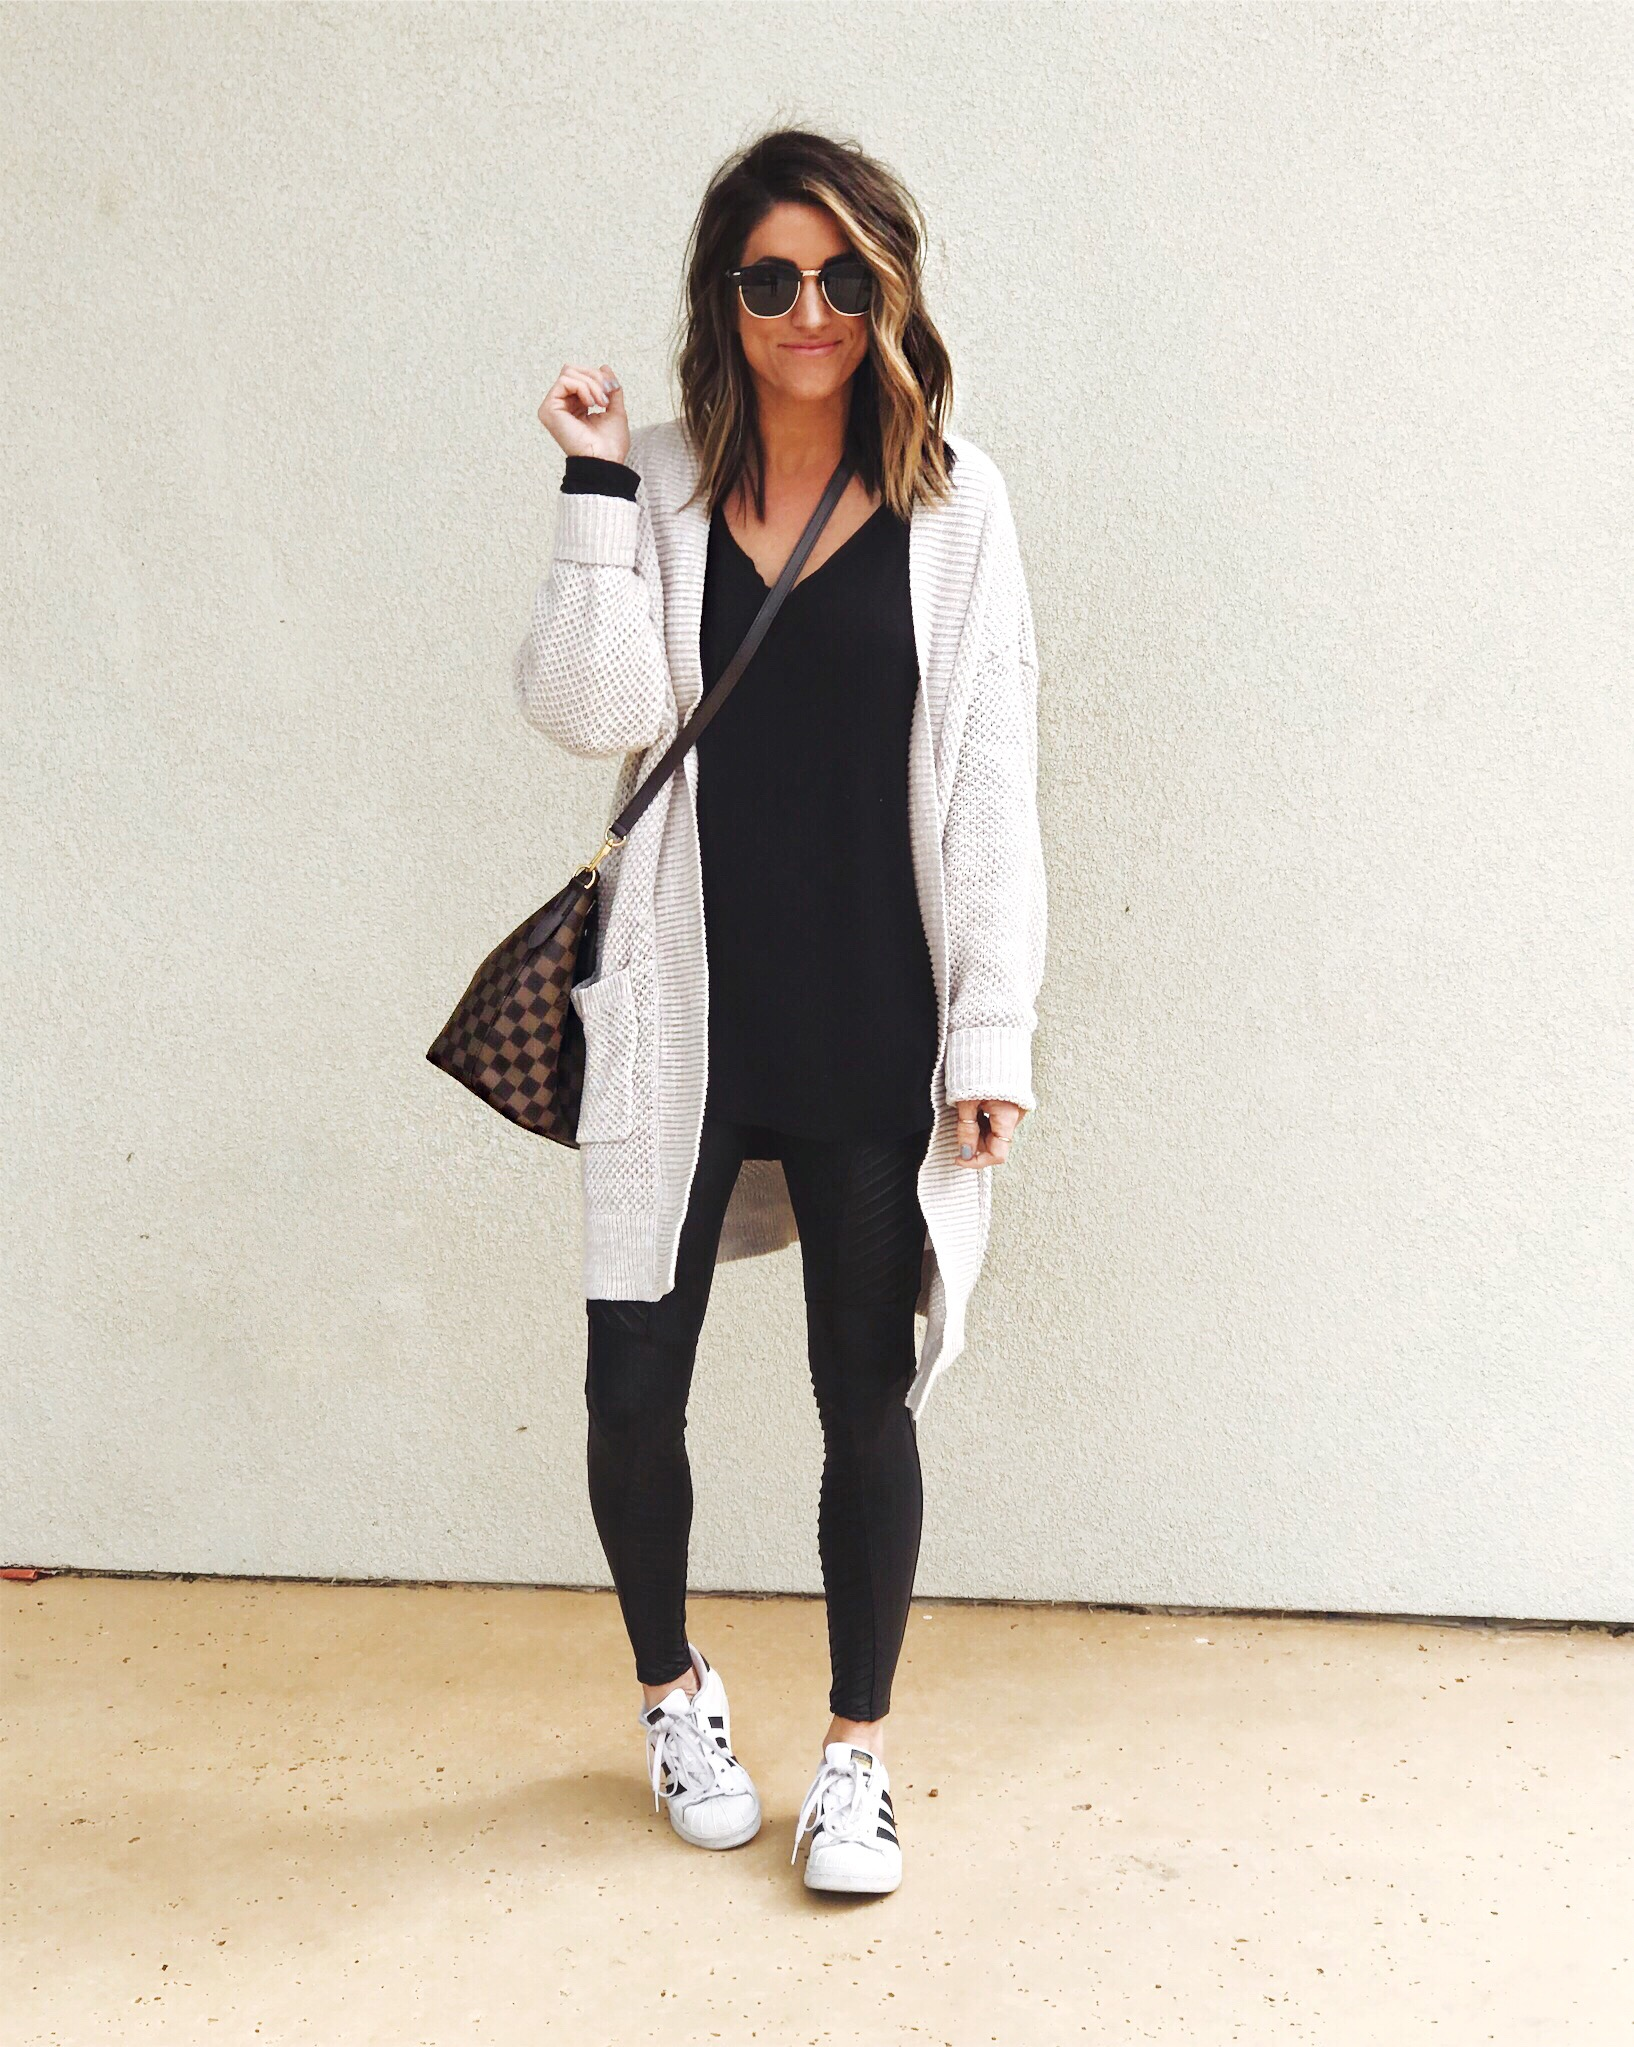 Adidas, cardigan, leggings outfit